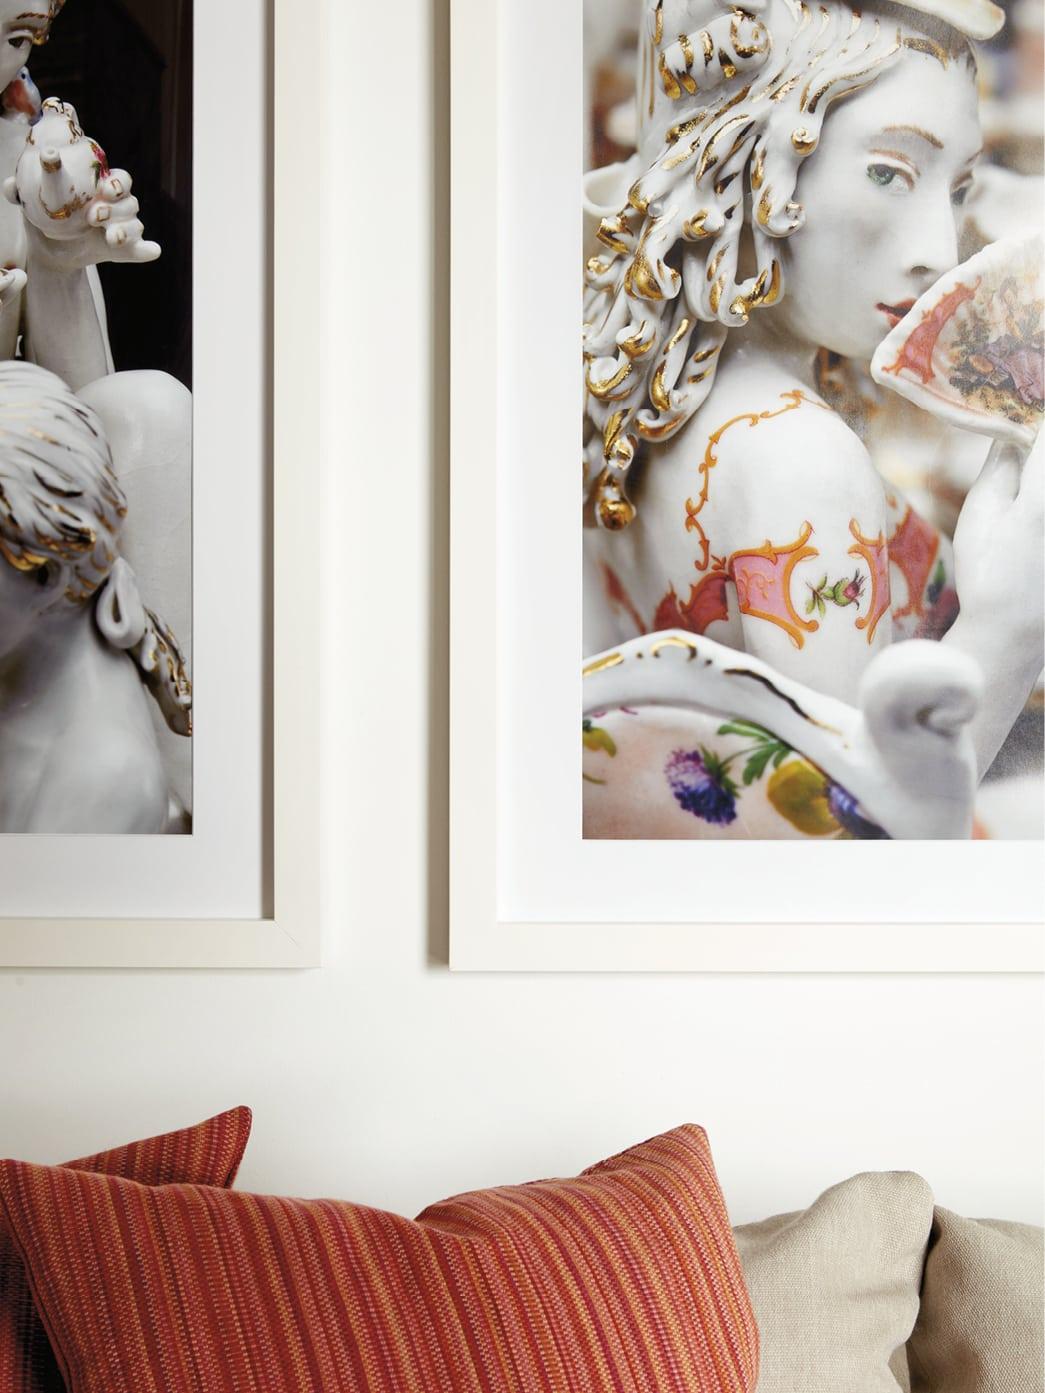 Closeup of photos on a wall